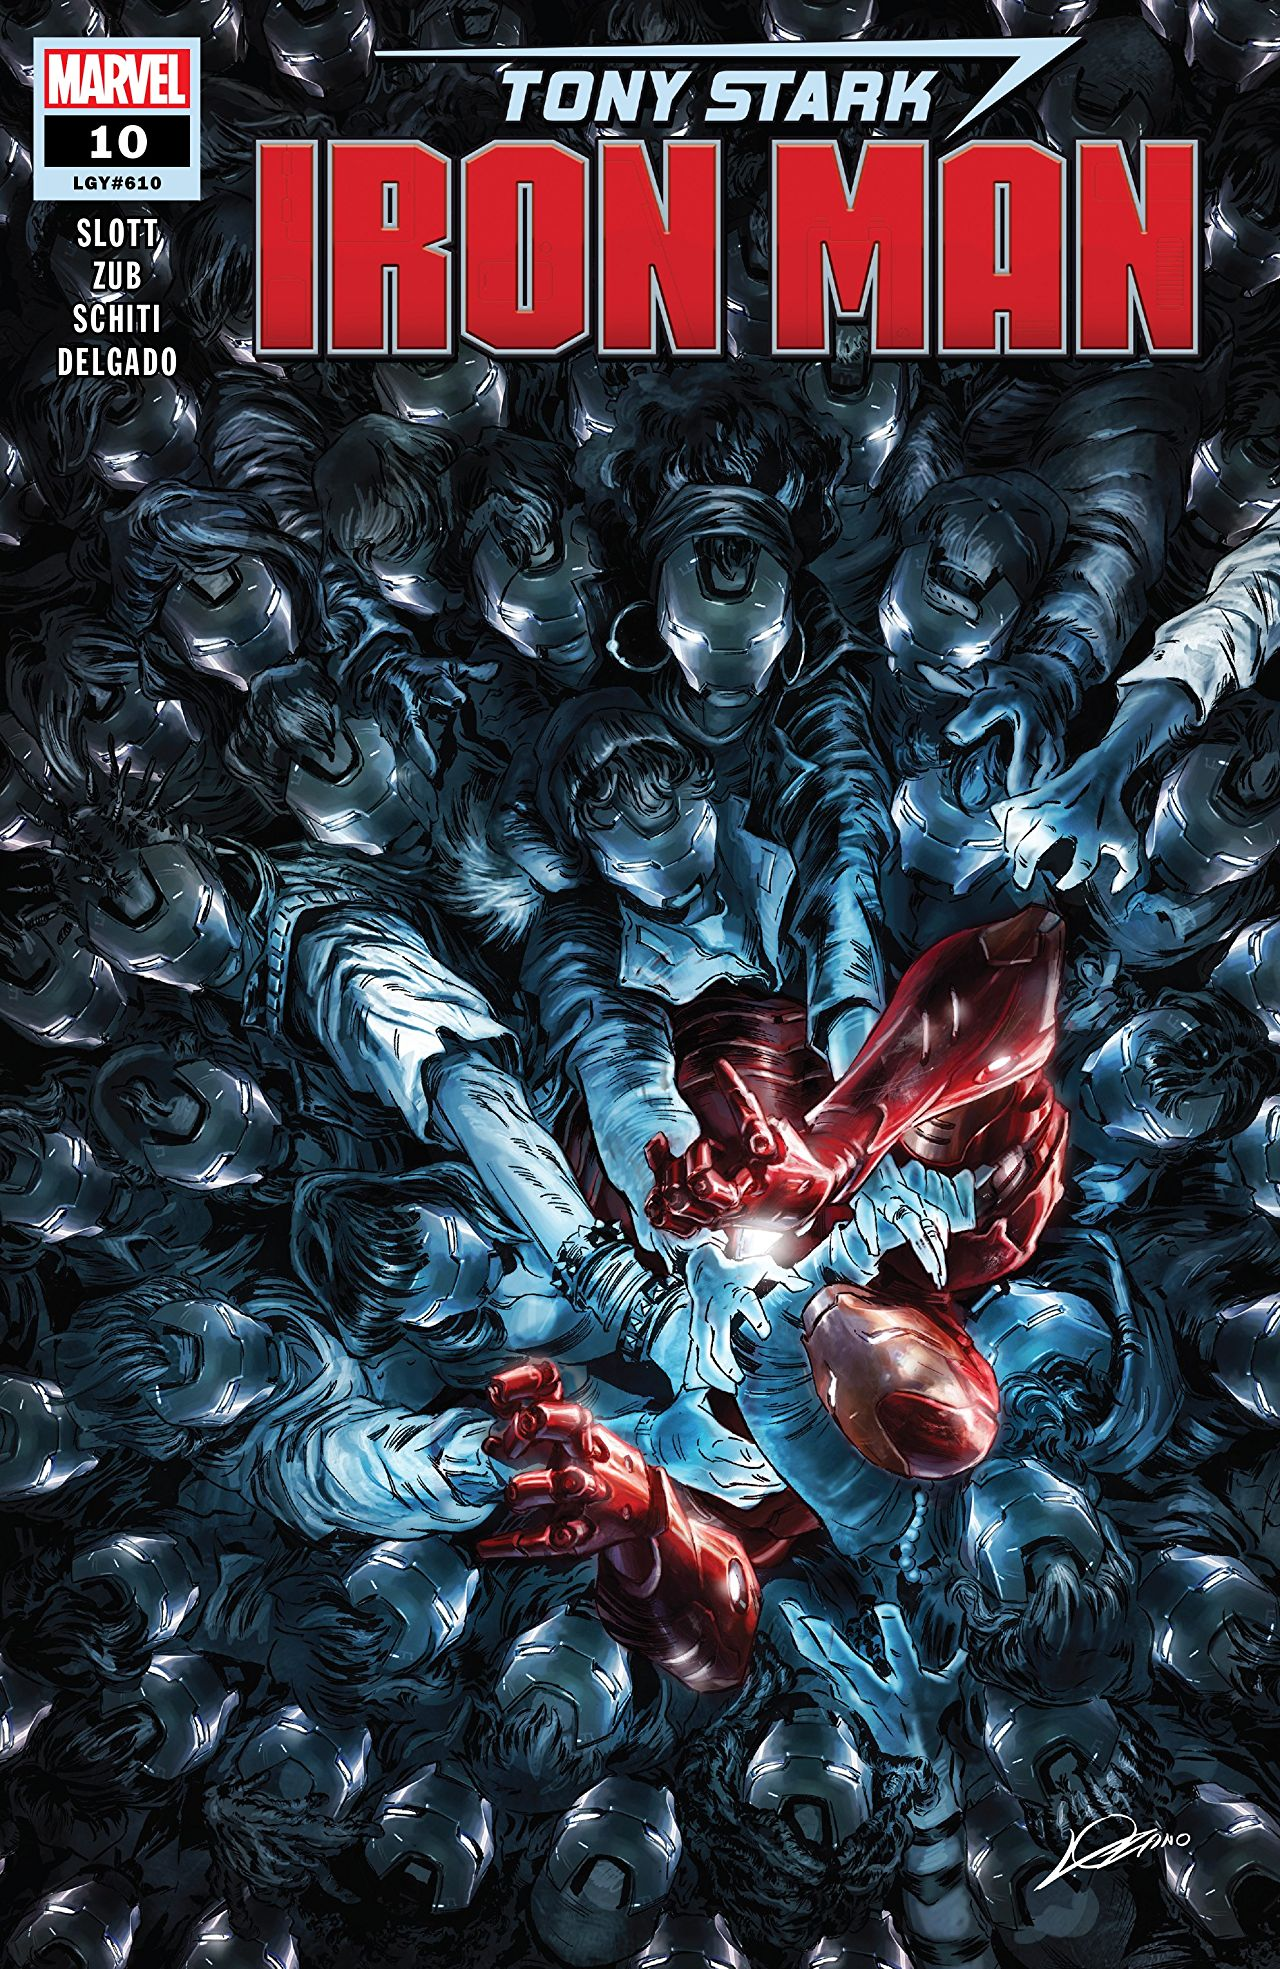 Tony Stark - Iron Man 10